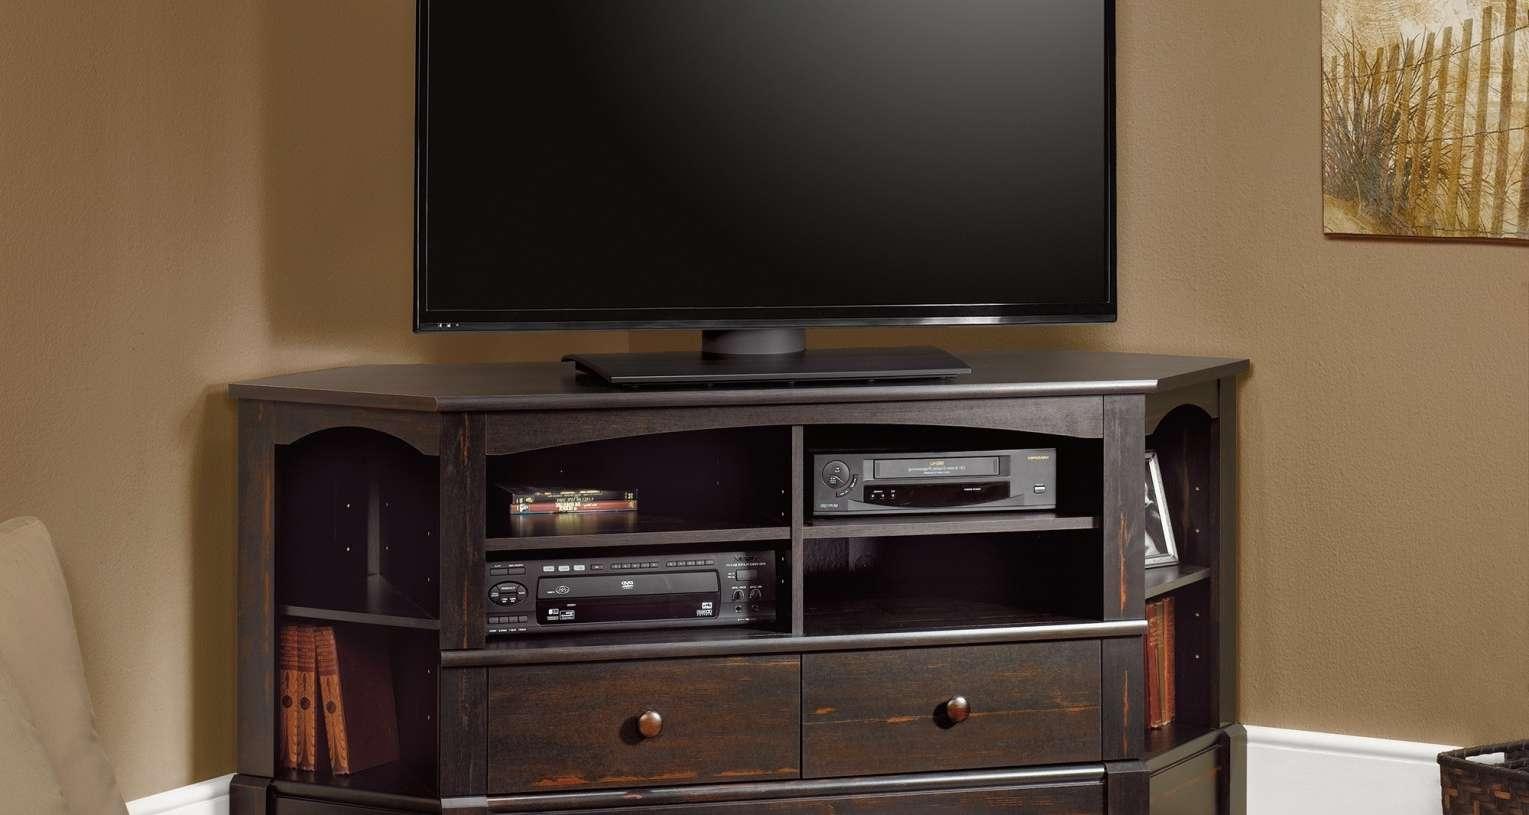 Cabinet : Black Mahogany Wood Corner Tv Stand With Storage Shelves Inside Mahogany Corner Tv Cabinets (View 11 of 20)